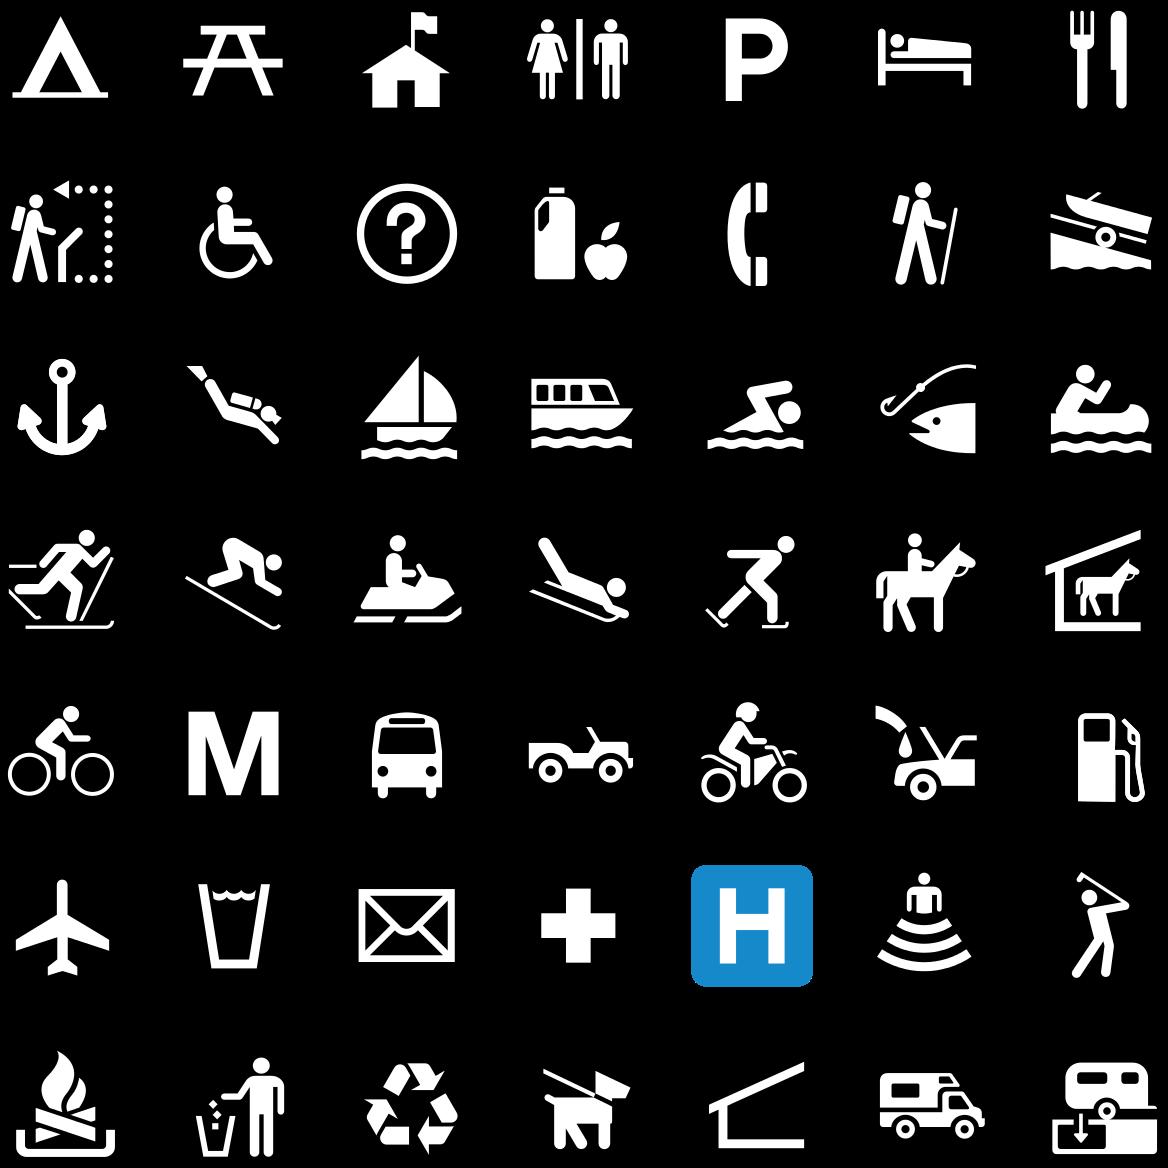 National Park Service sample pictographs 아이콘 모음, 클립 아트, 아이콘